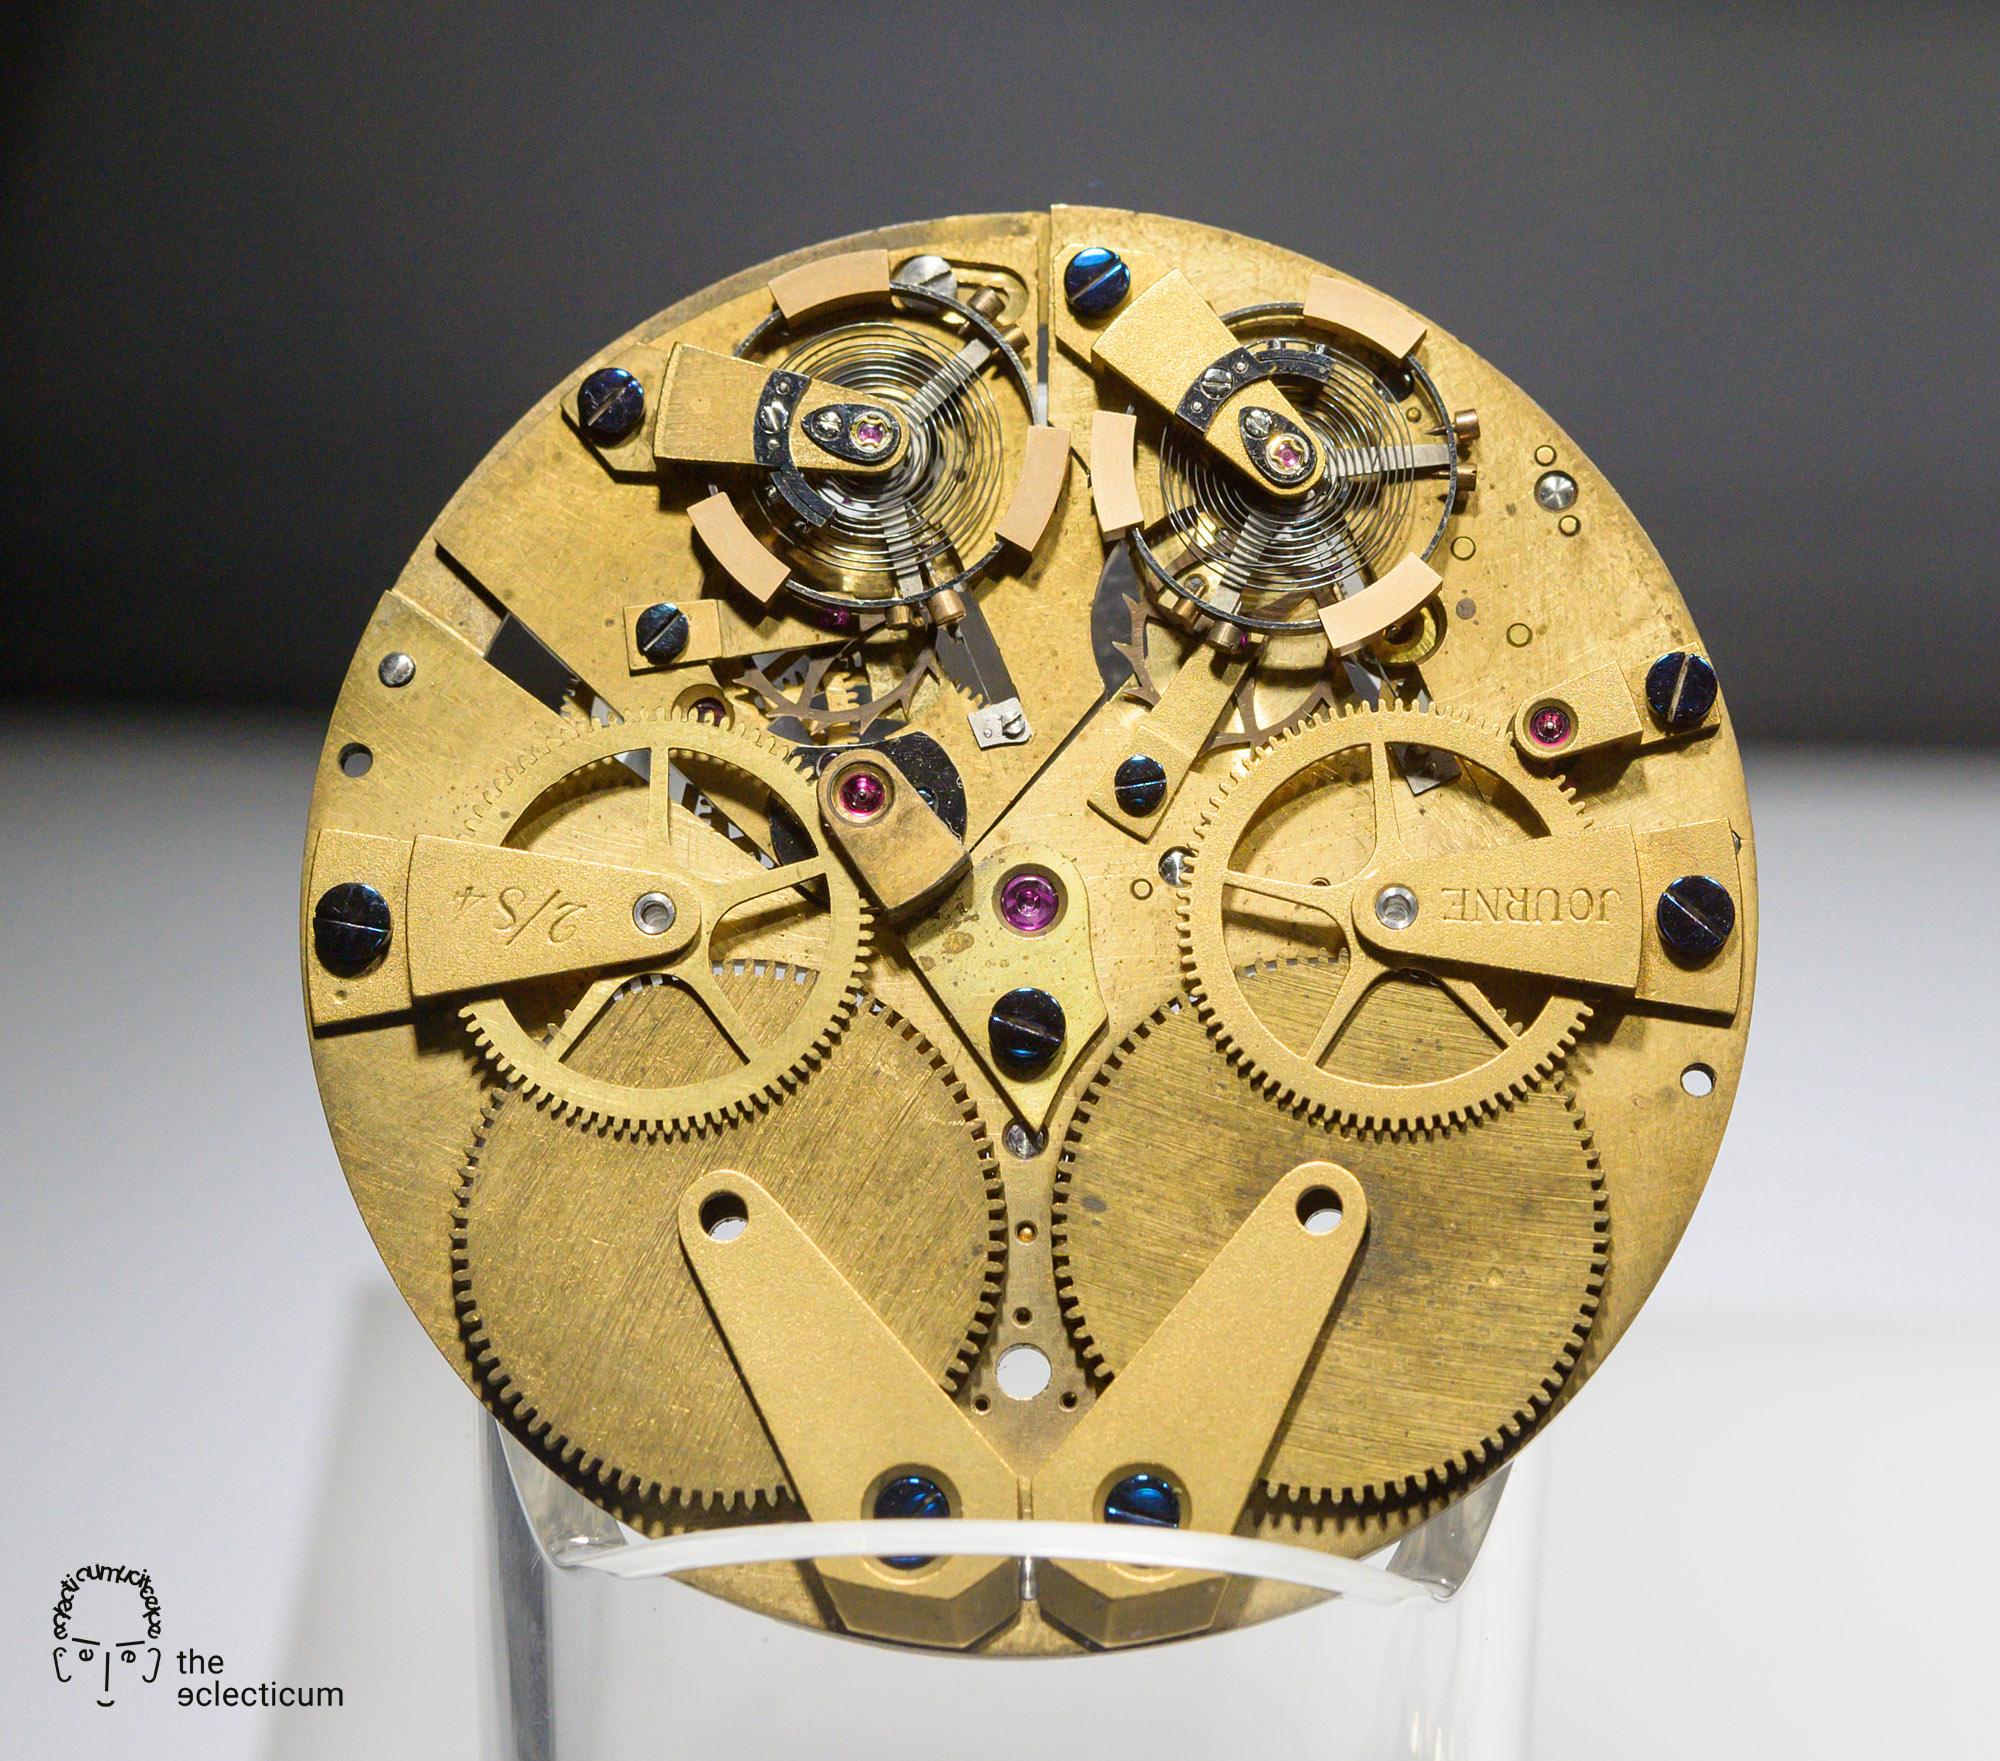 François-Paul Journe resonance pocket watch movement 1984